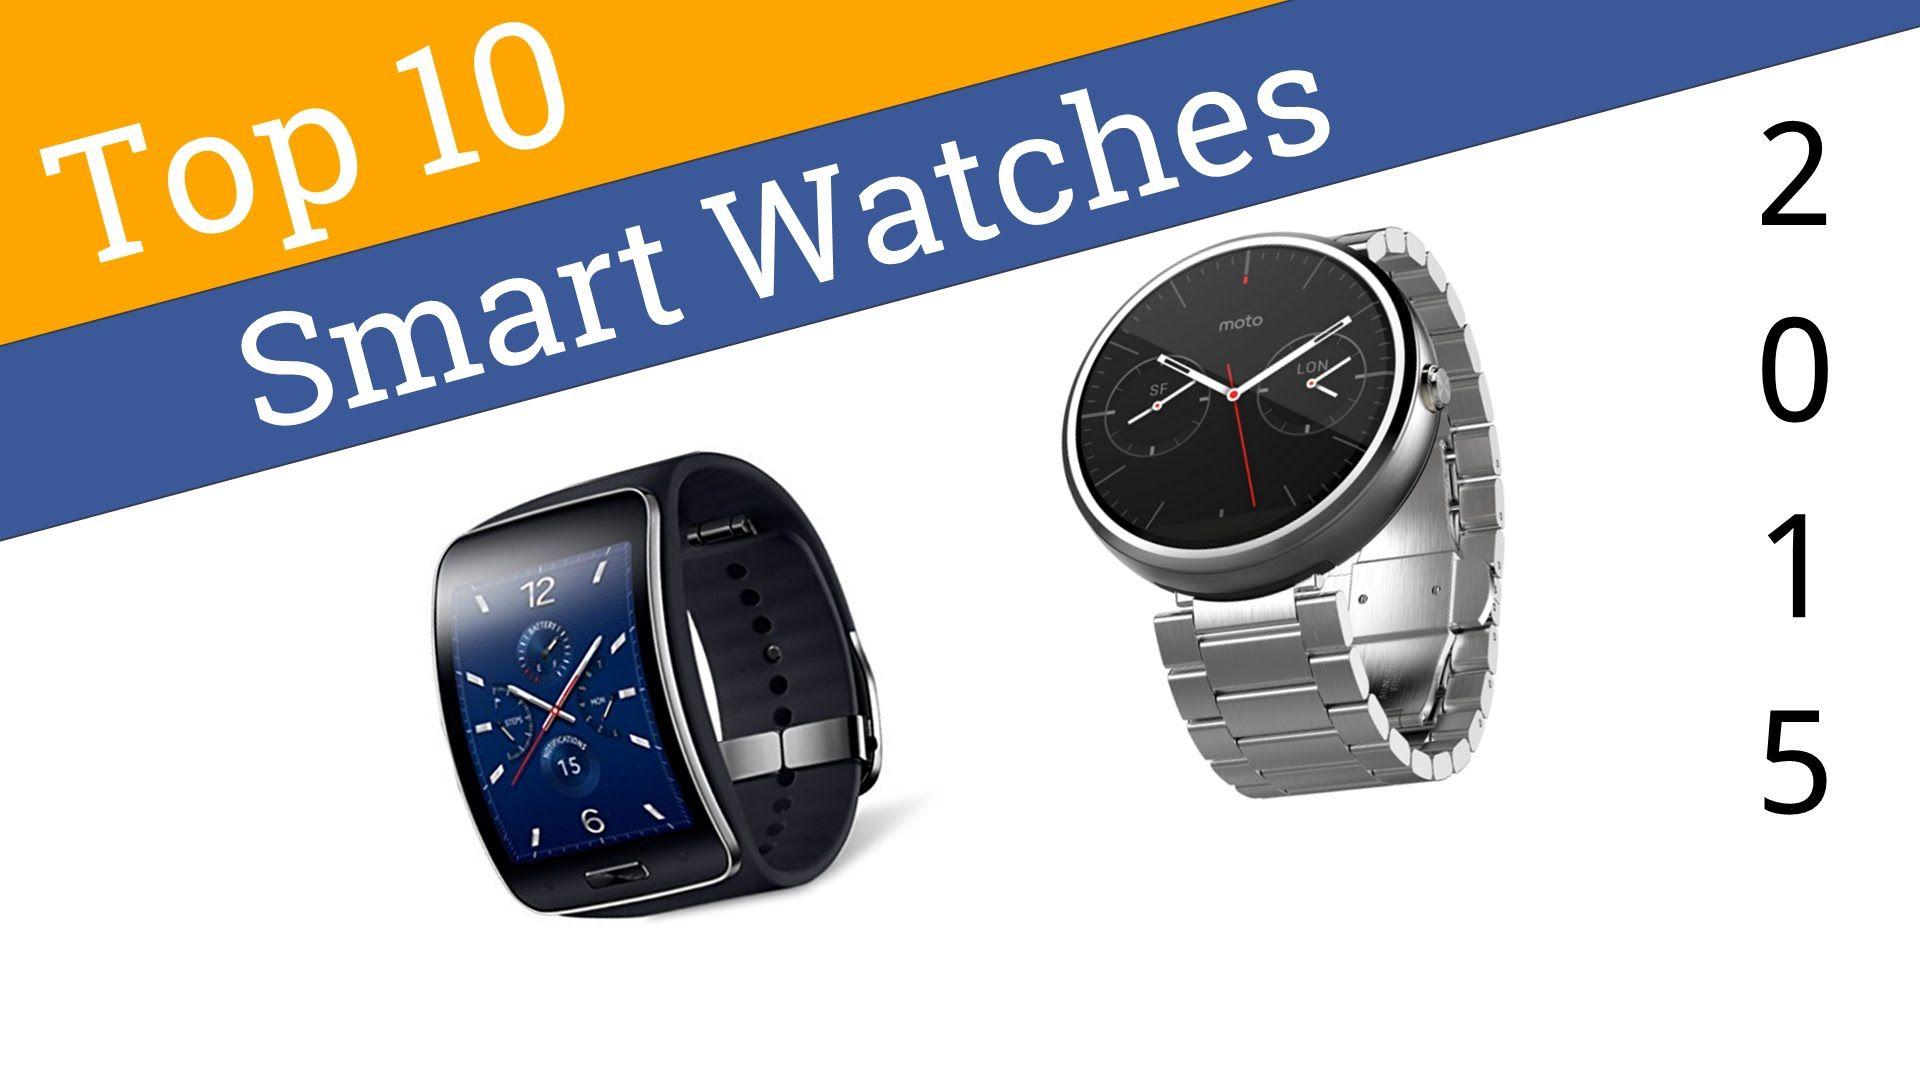 10 Best Smart Watches 2015 Best smart watches, Smart